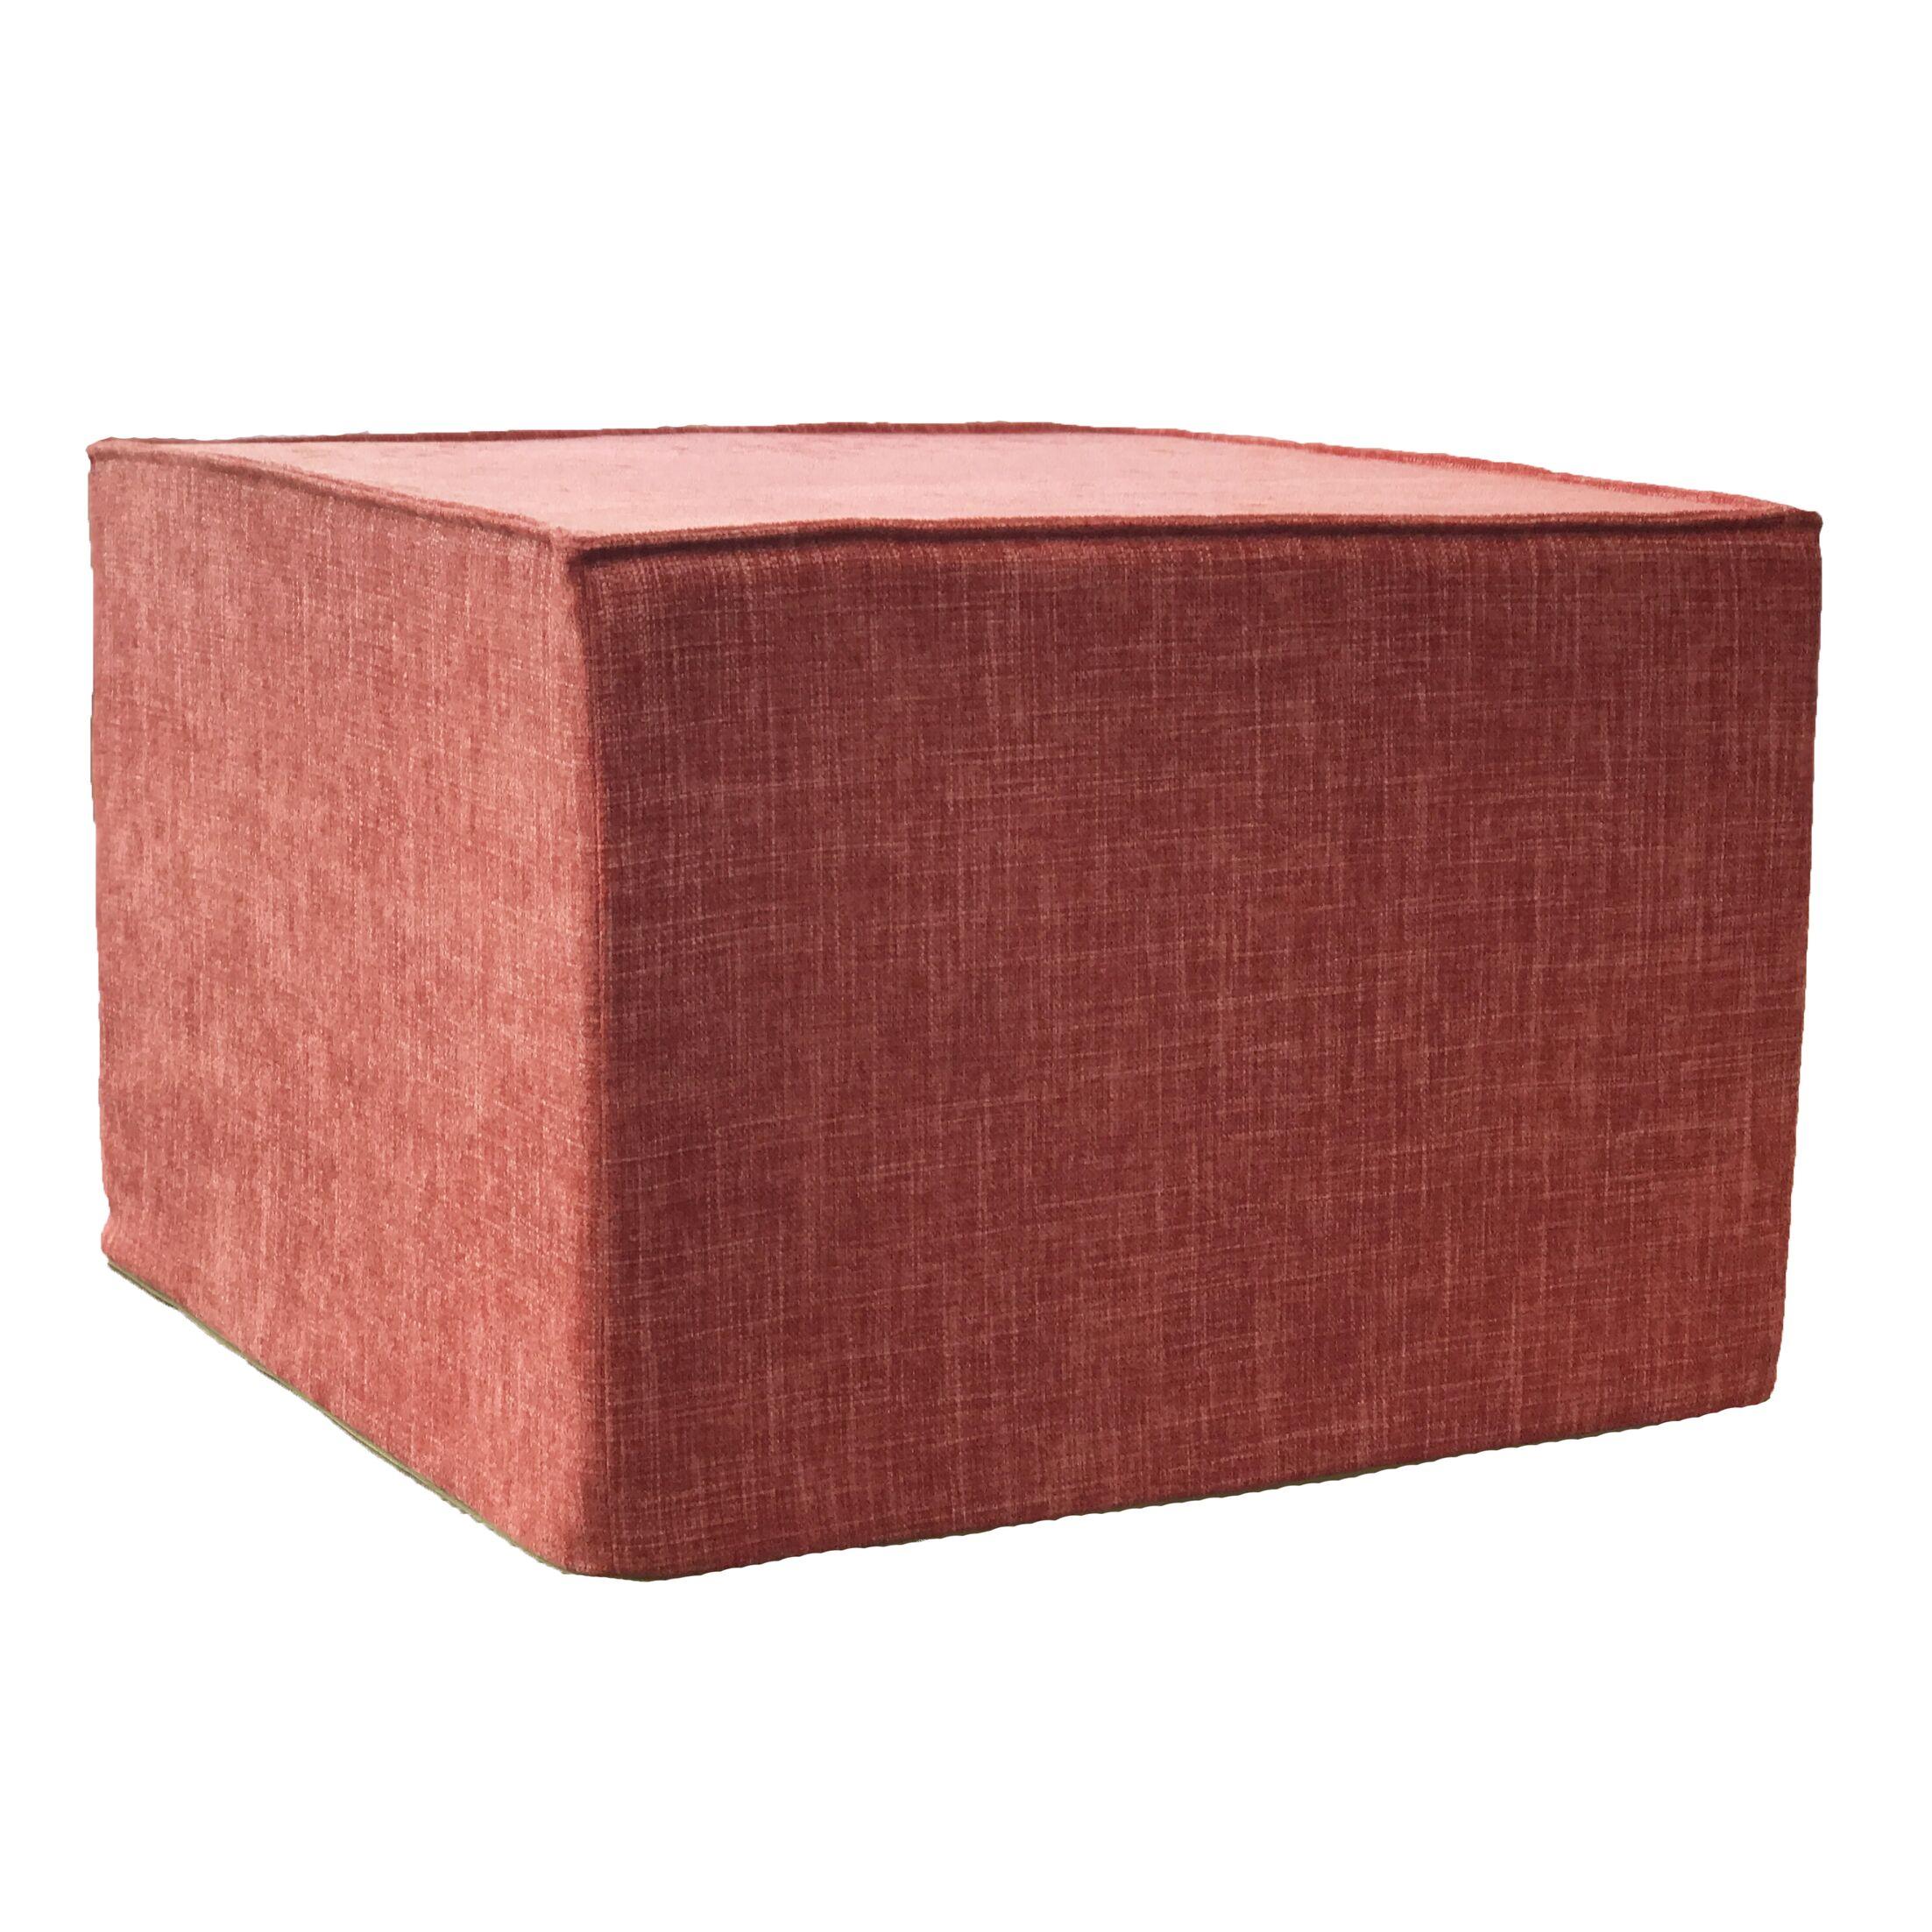 Edmiston Ottoman Fabric: Red